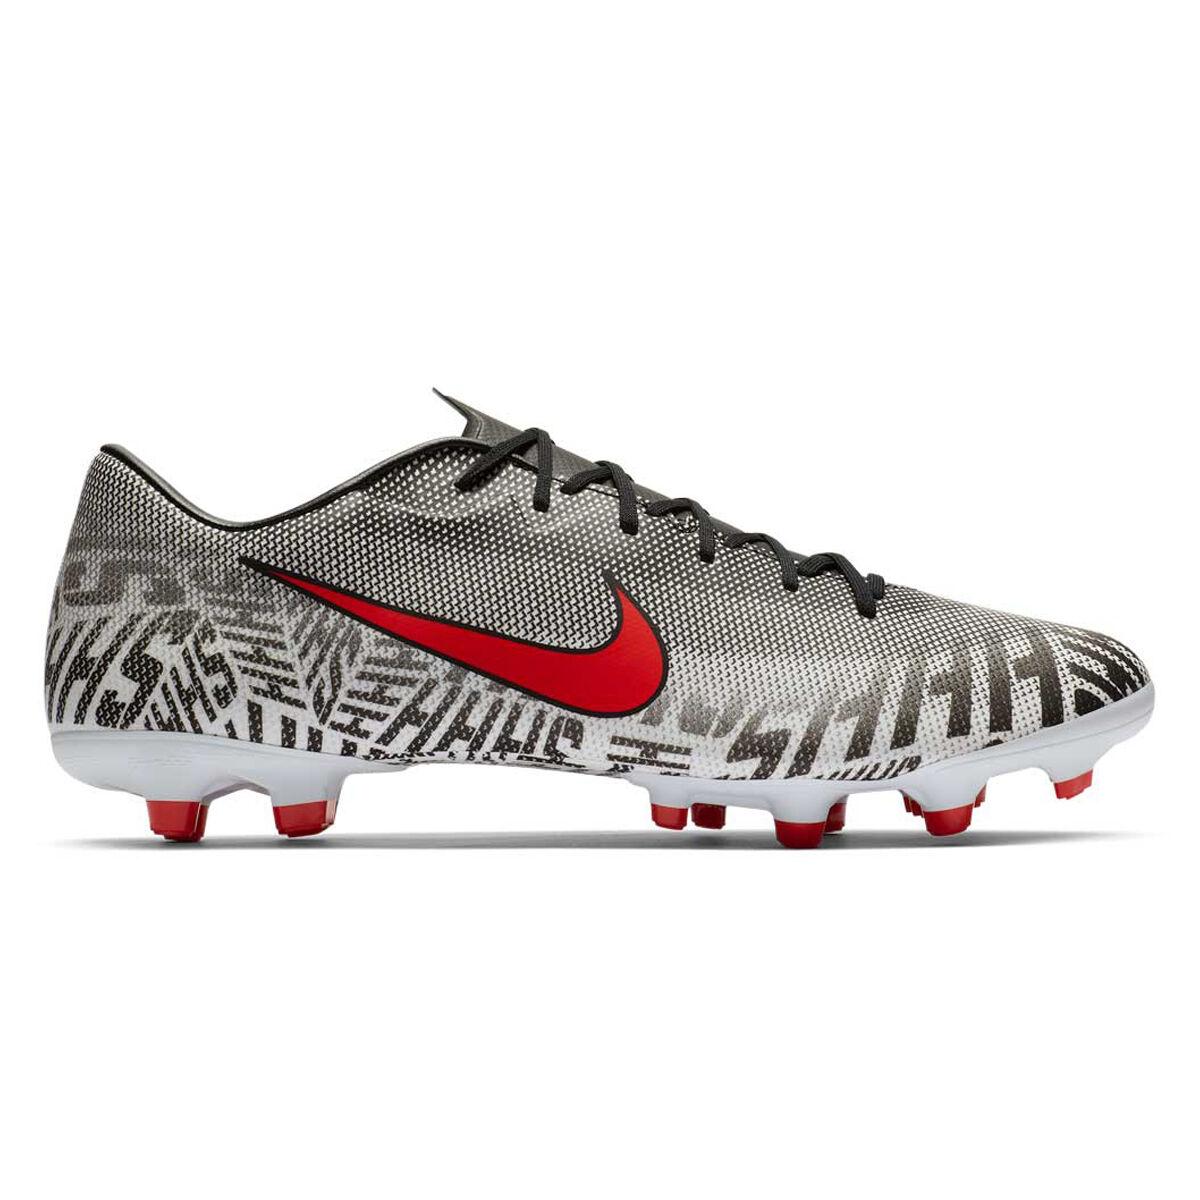 Nike Mercurial Vapor XII Academy Neymar